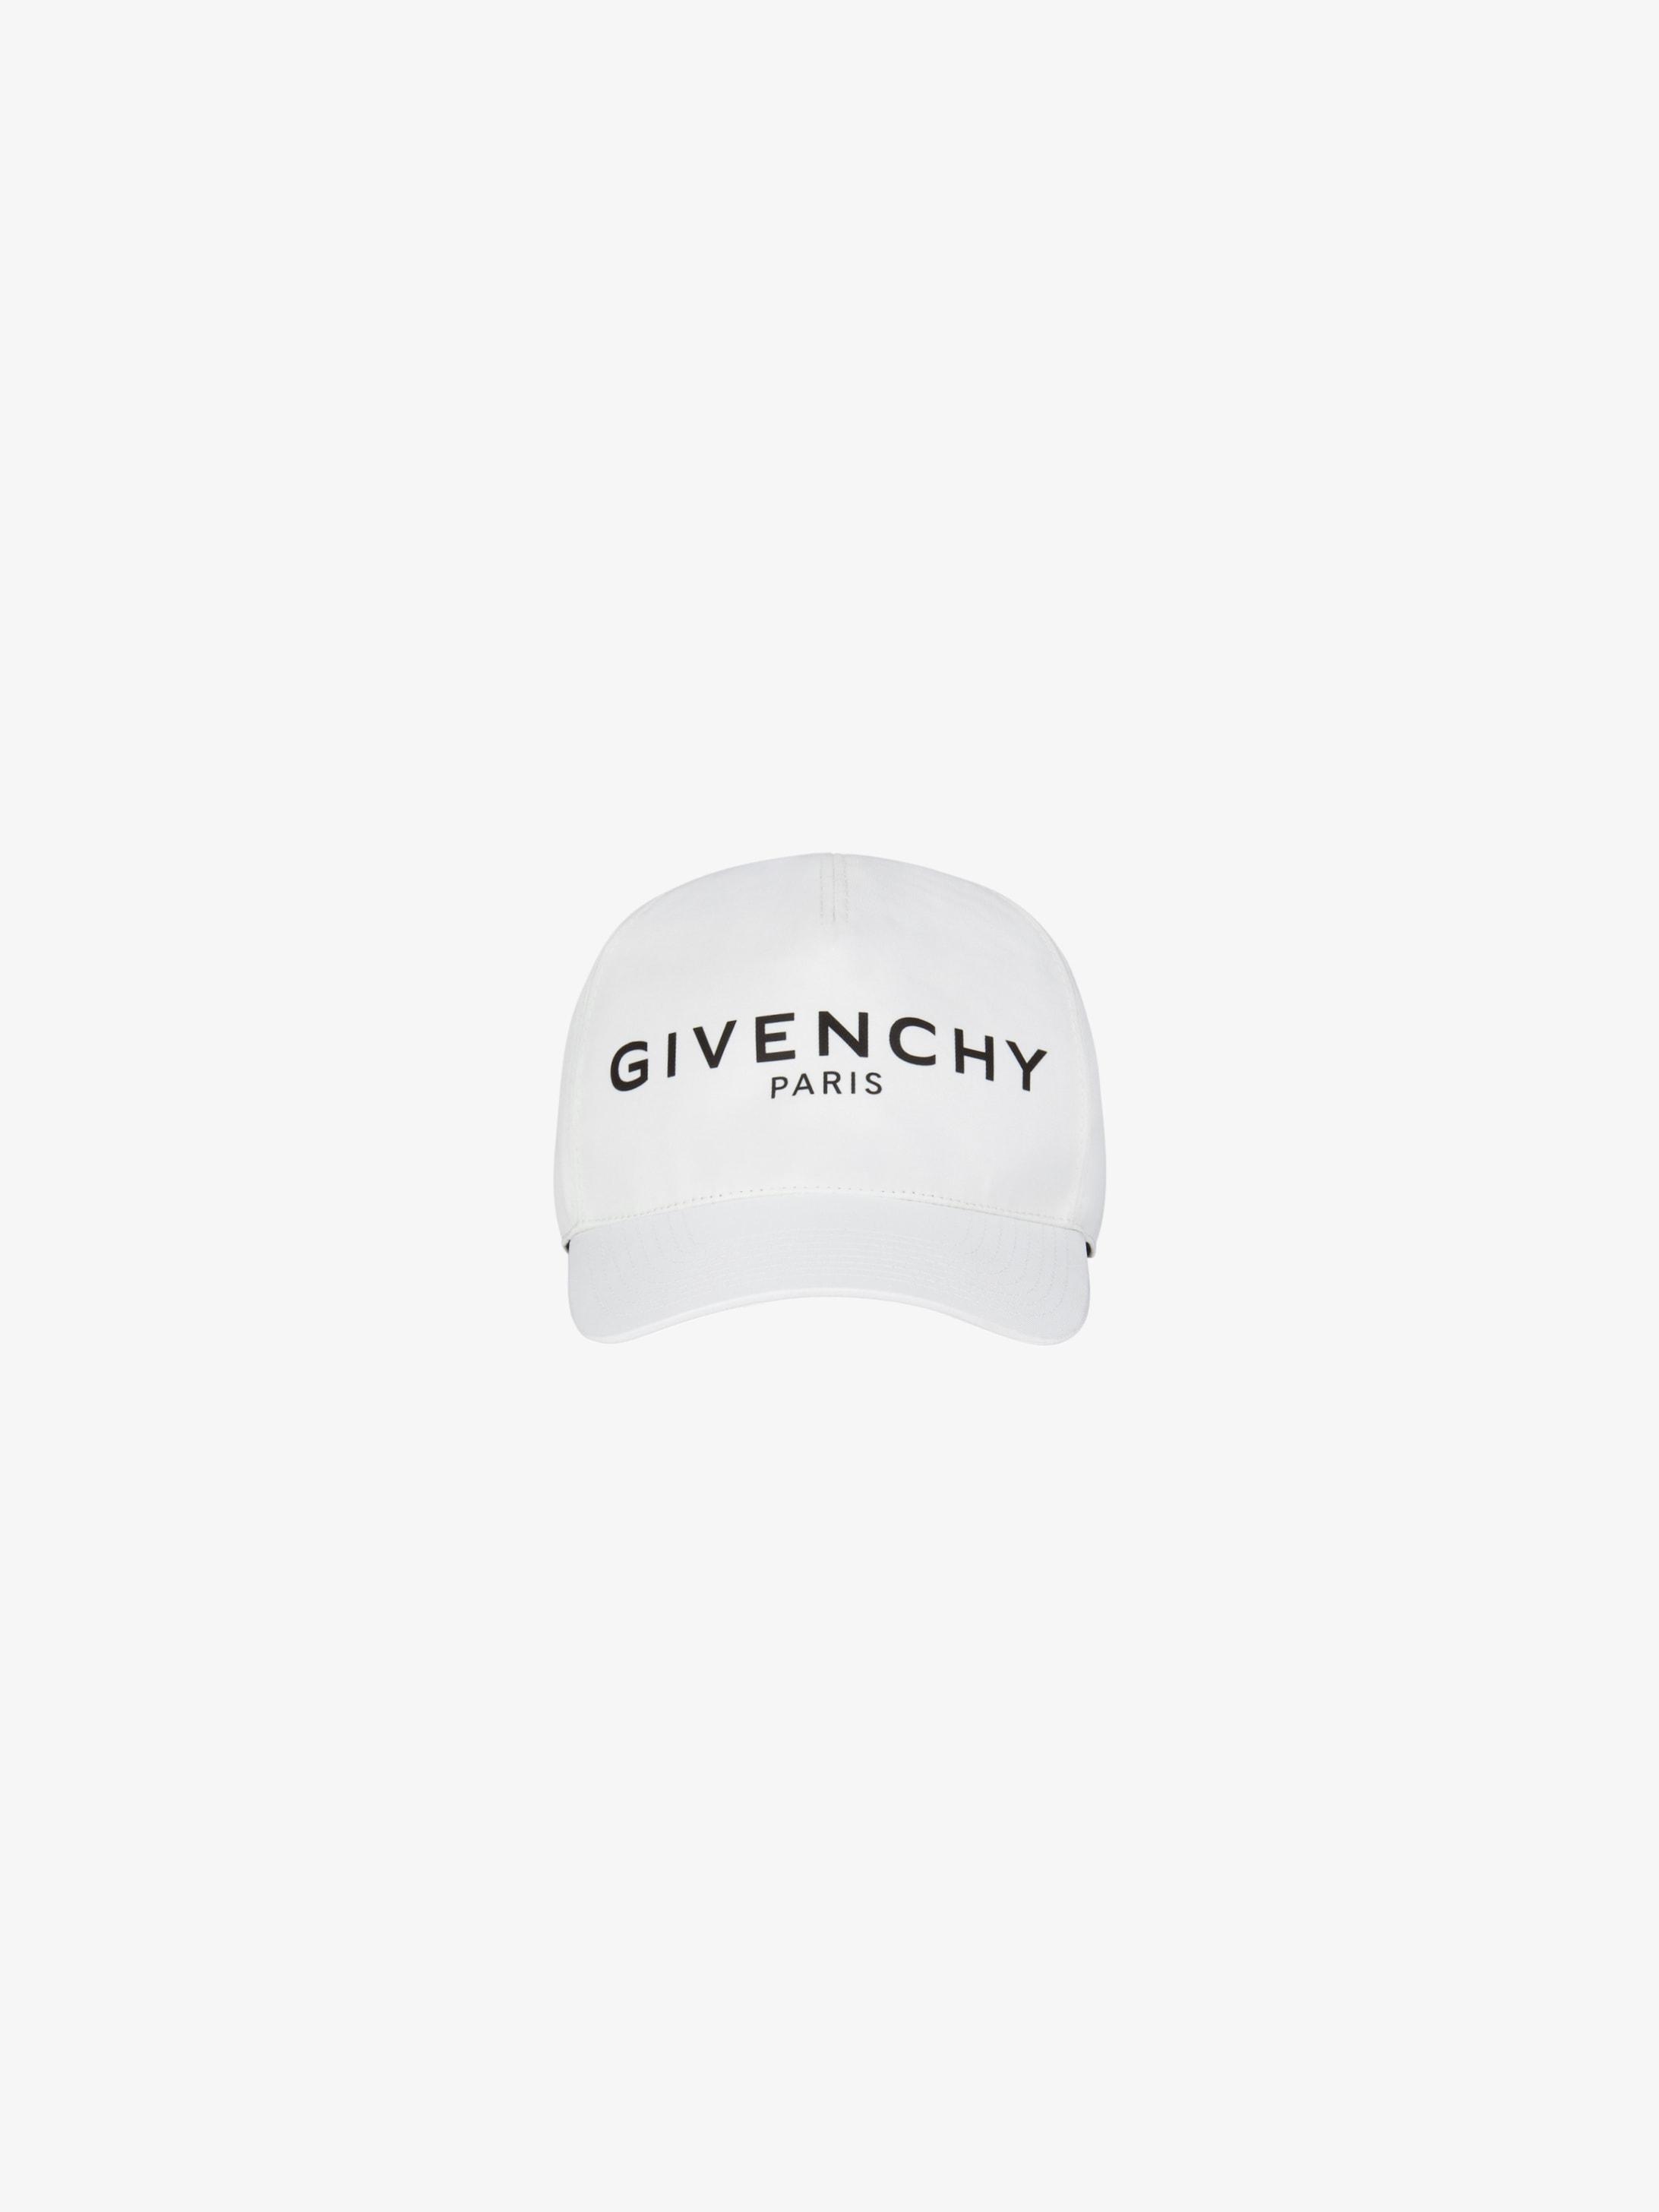 GIVENCHY PARIS cap in nylon